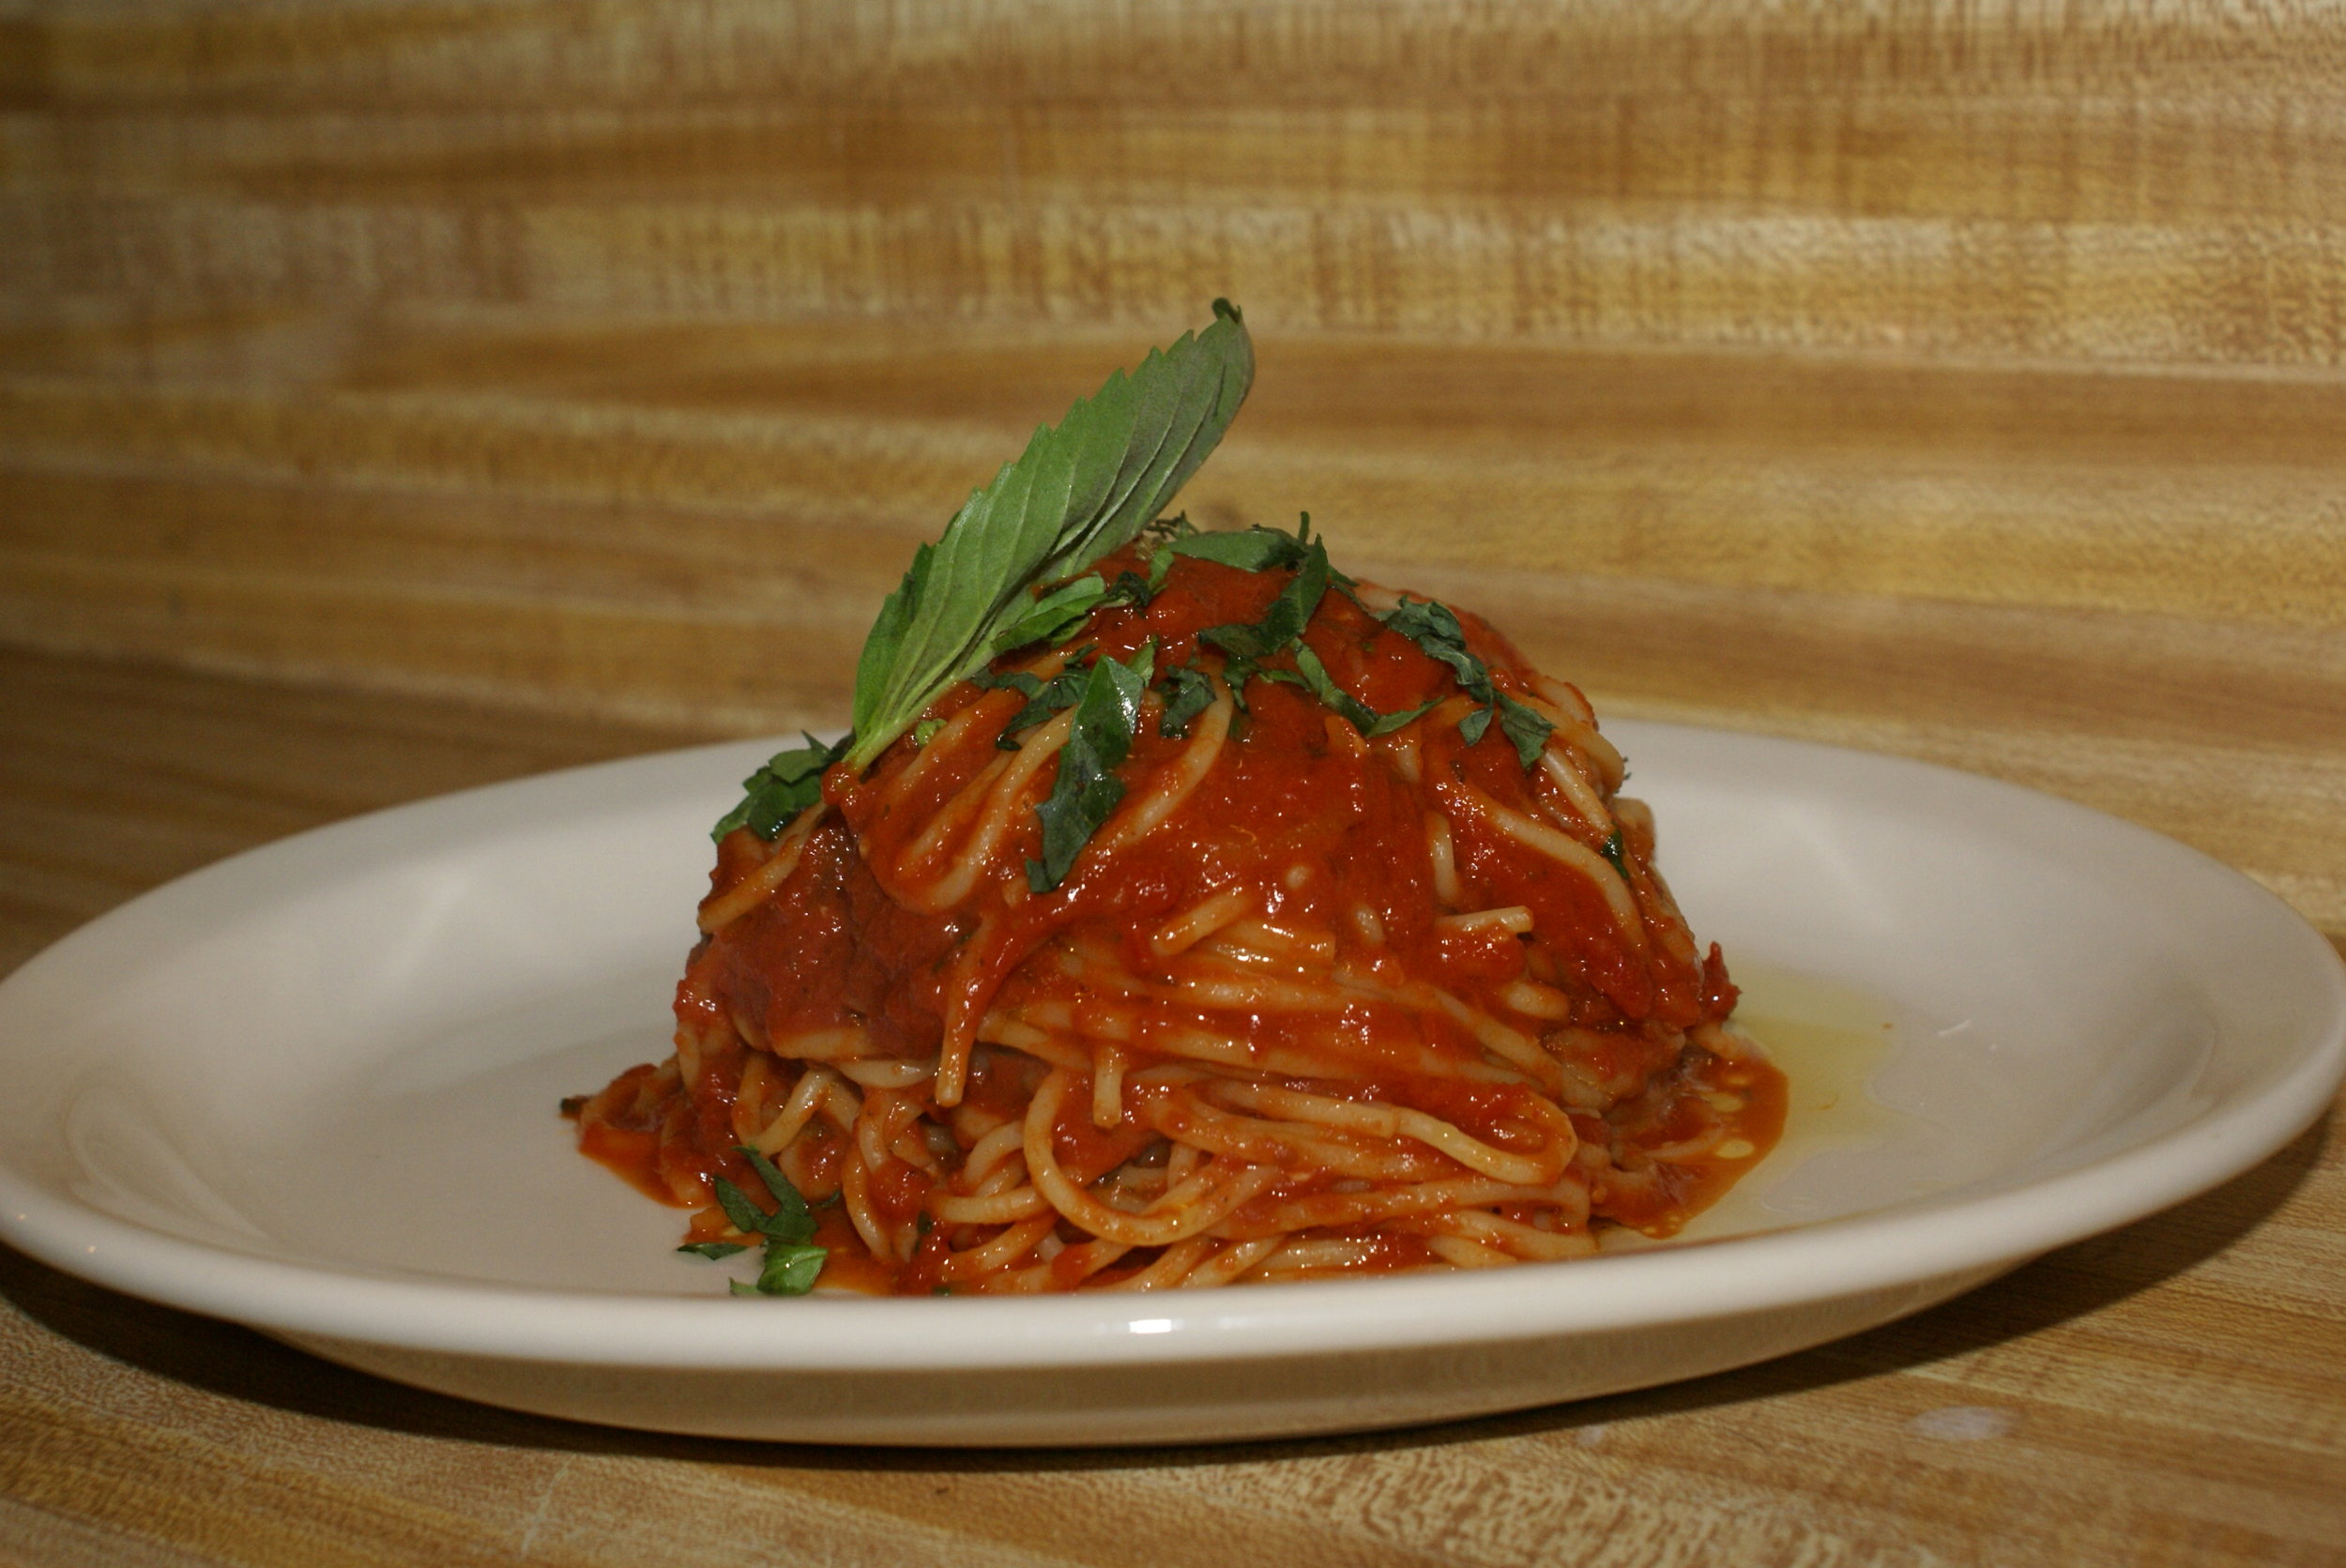 Spaghetti Marinara - tasty, classic, and comforting